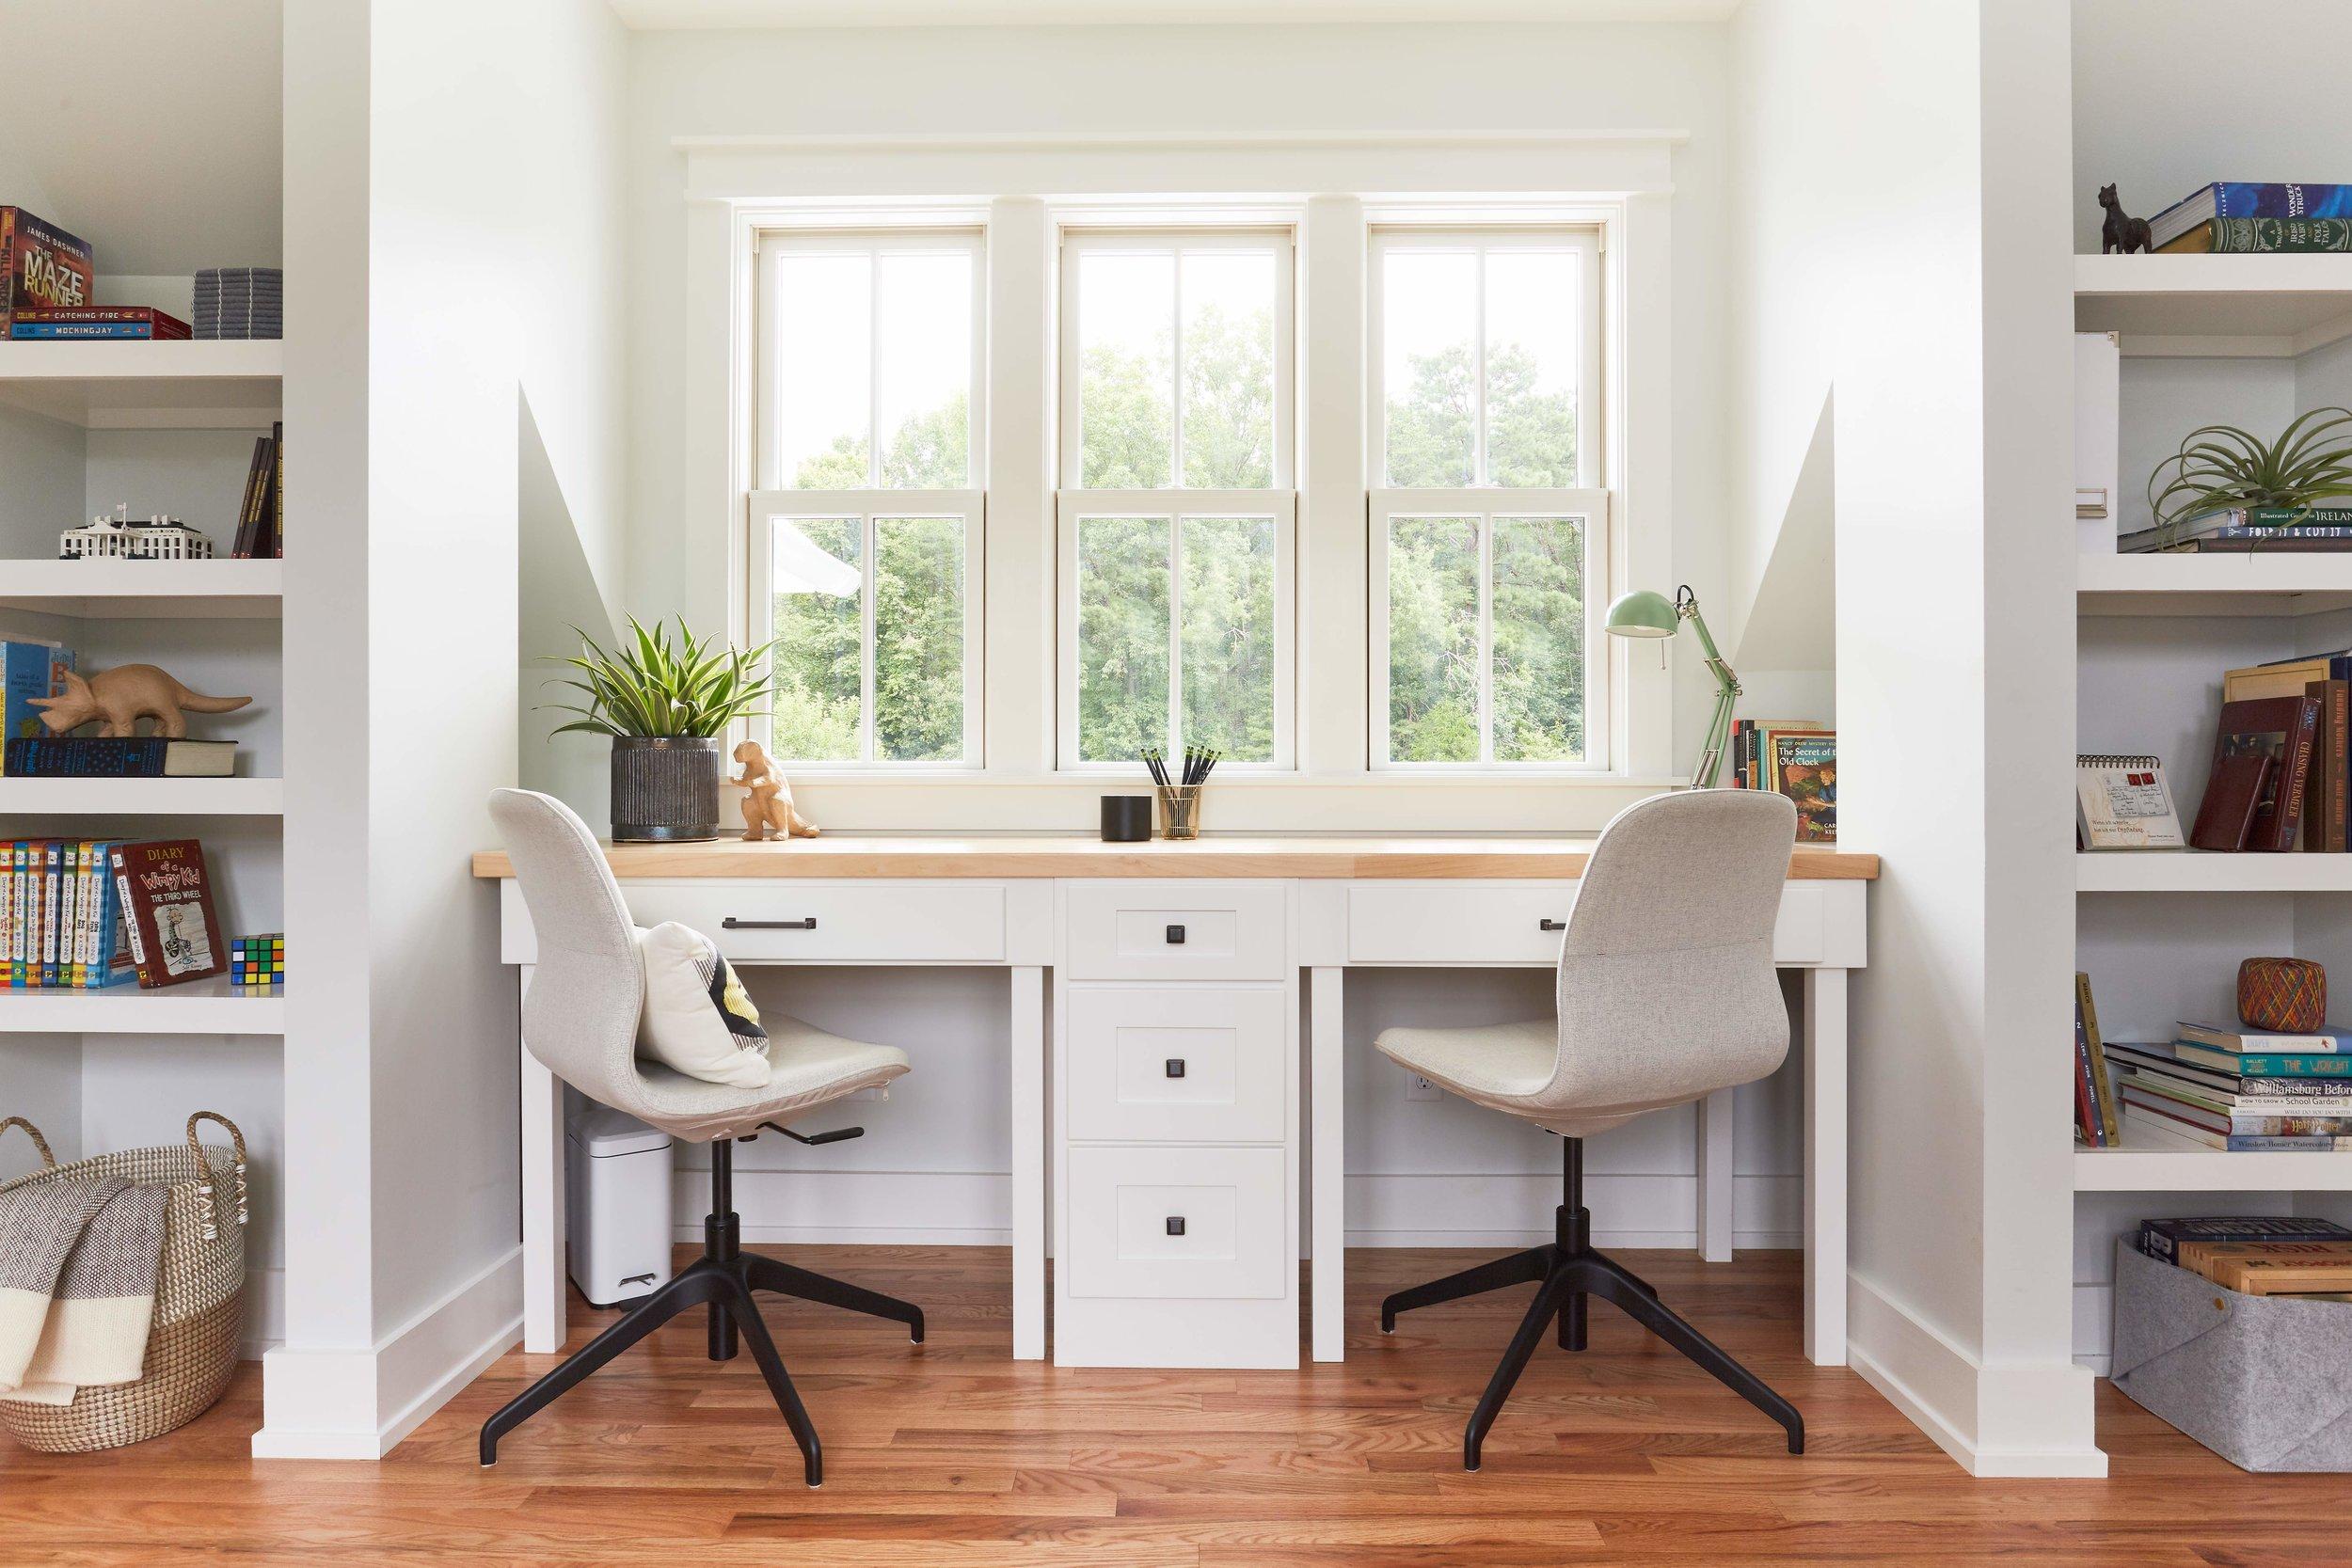 New dormer and custom built-in desk in kids' study.